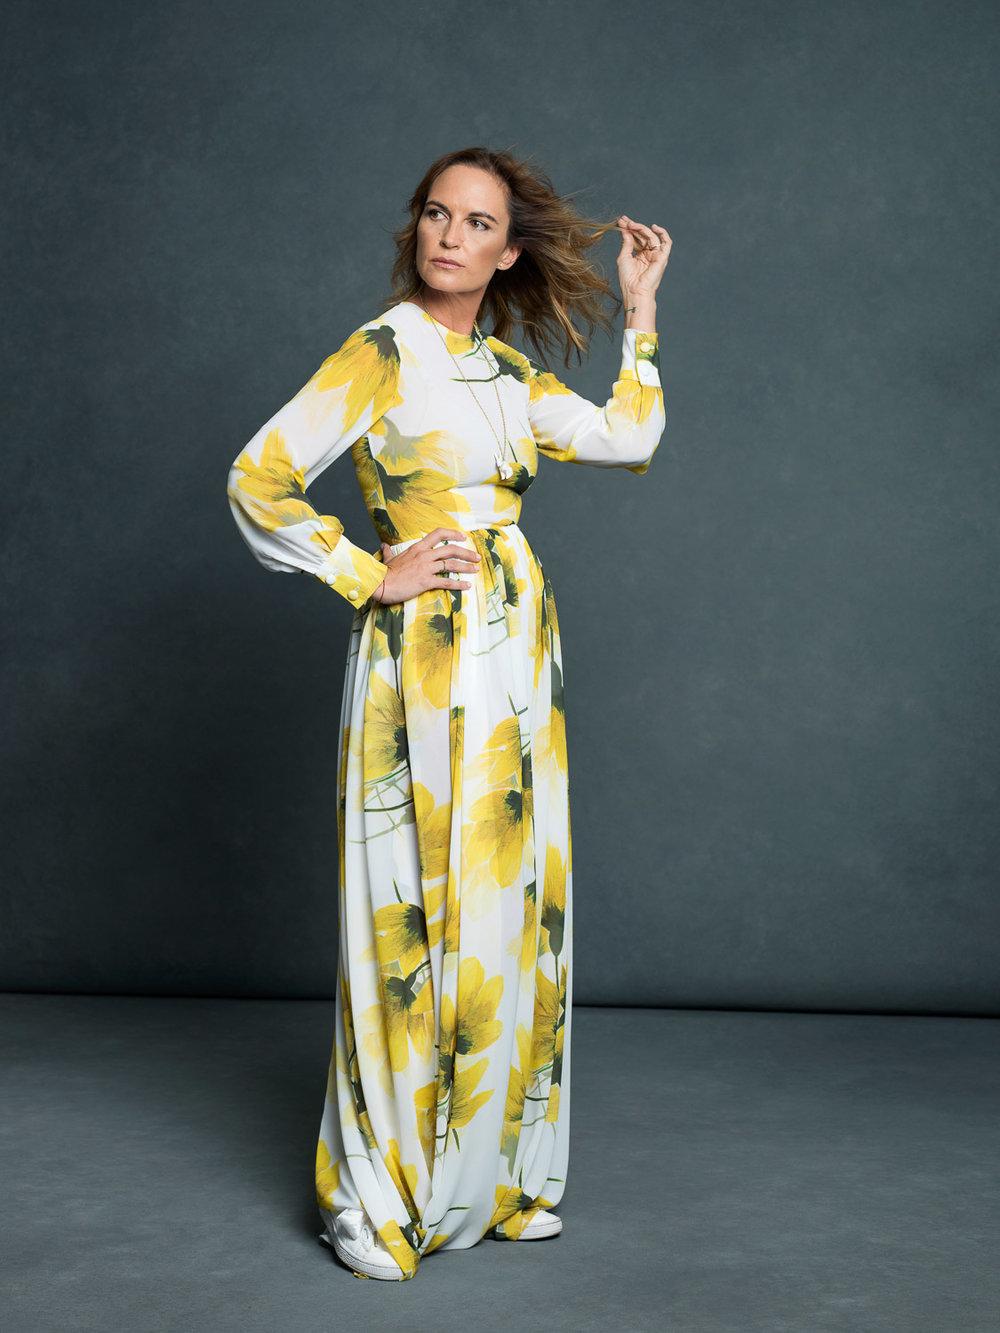 The Brand Maker - Paulina Cerezo in the Golden Dreams Dress.